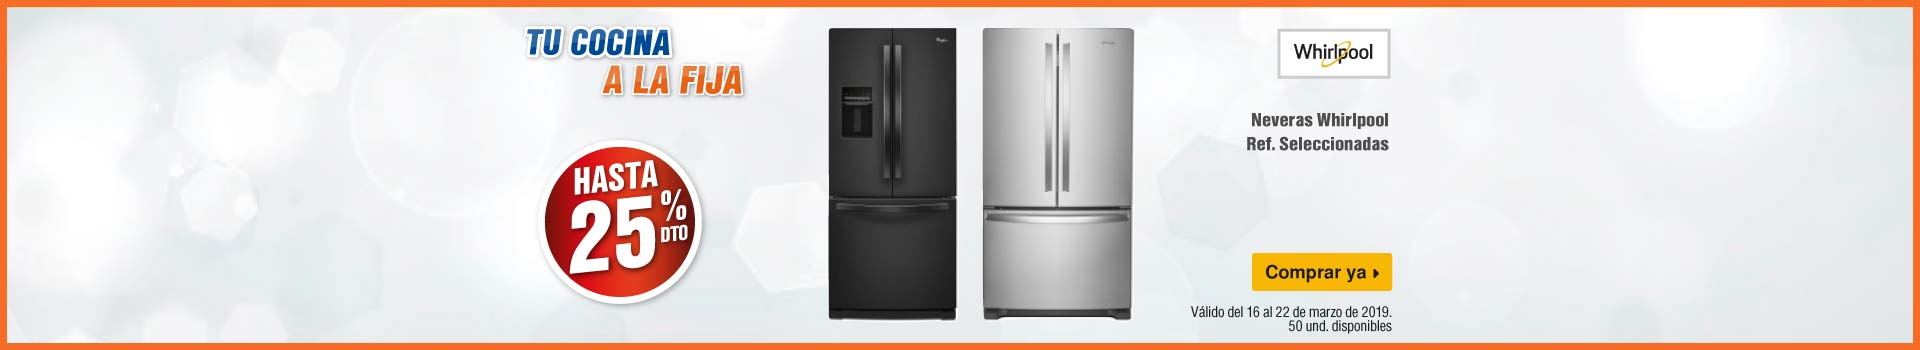 AK-KT-mayores-1-ELECT-BCAT-refrigeracion-WHIRLPOOL-160319-3